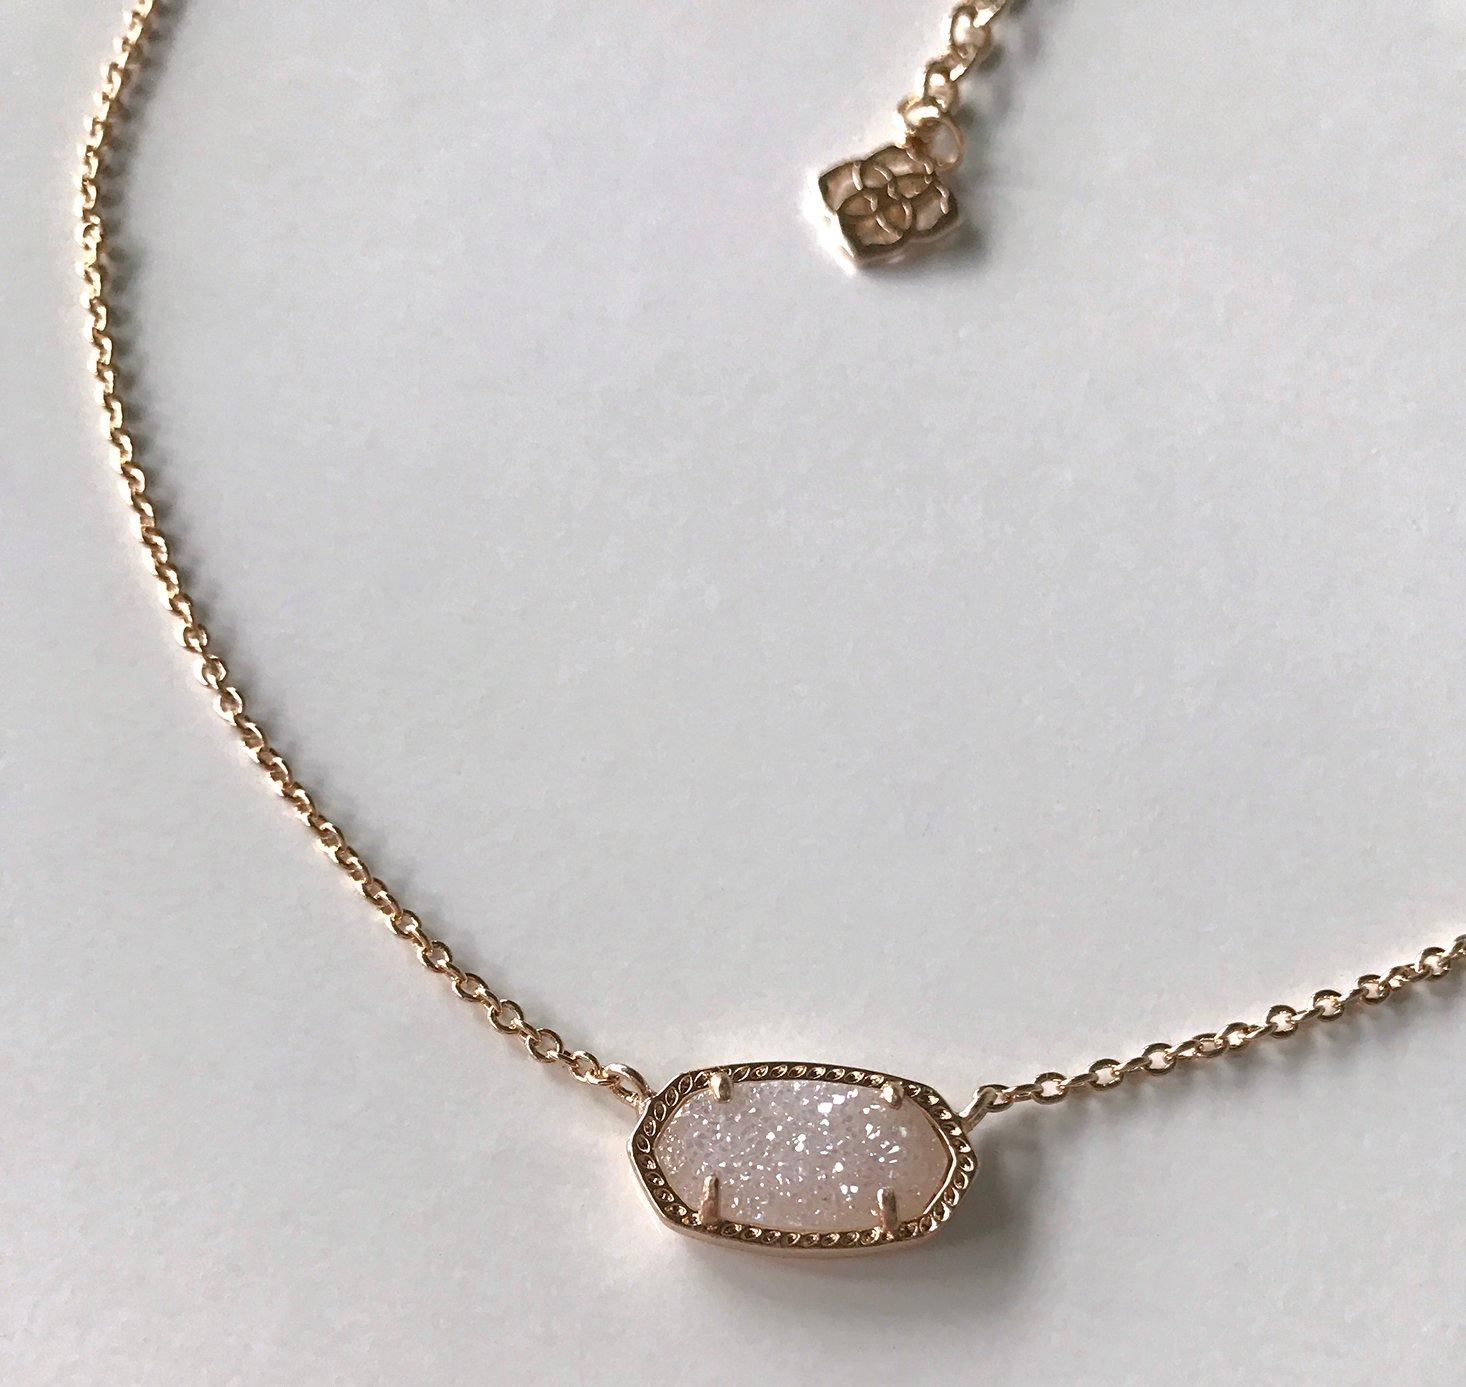 rocksbox-december-2016-kendra-scott-necklace-closeup